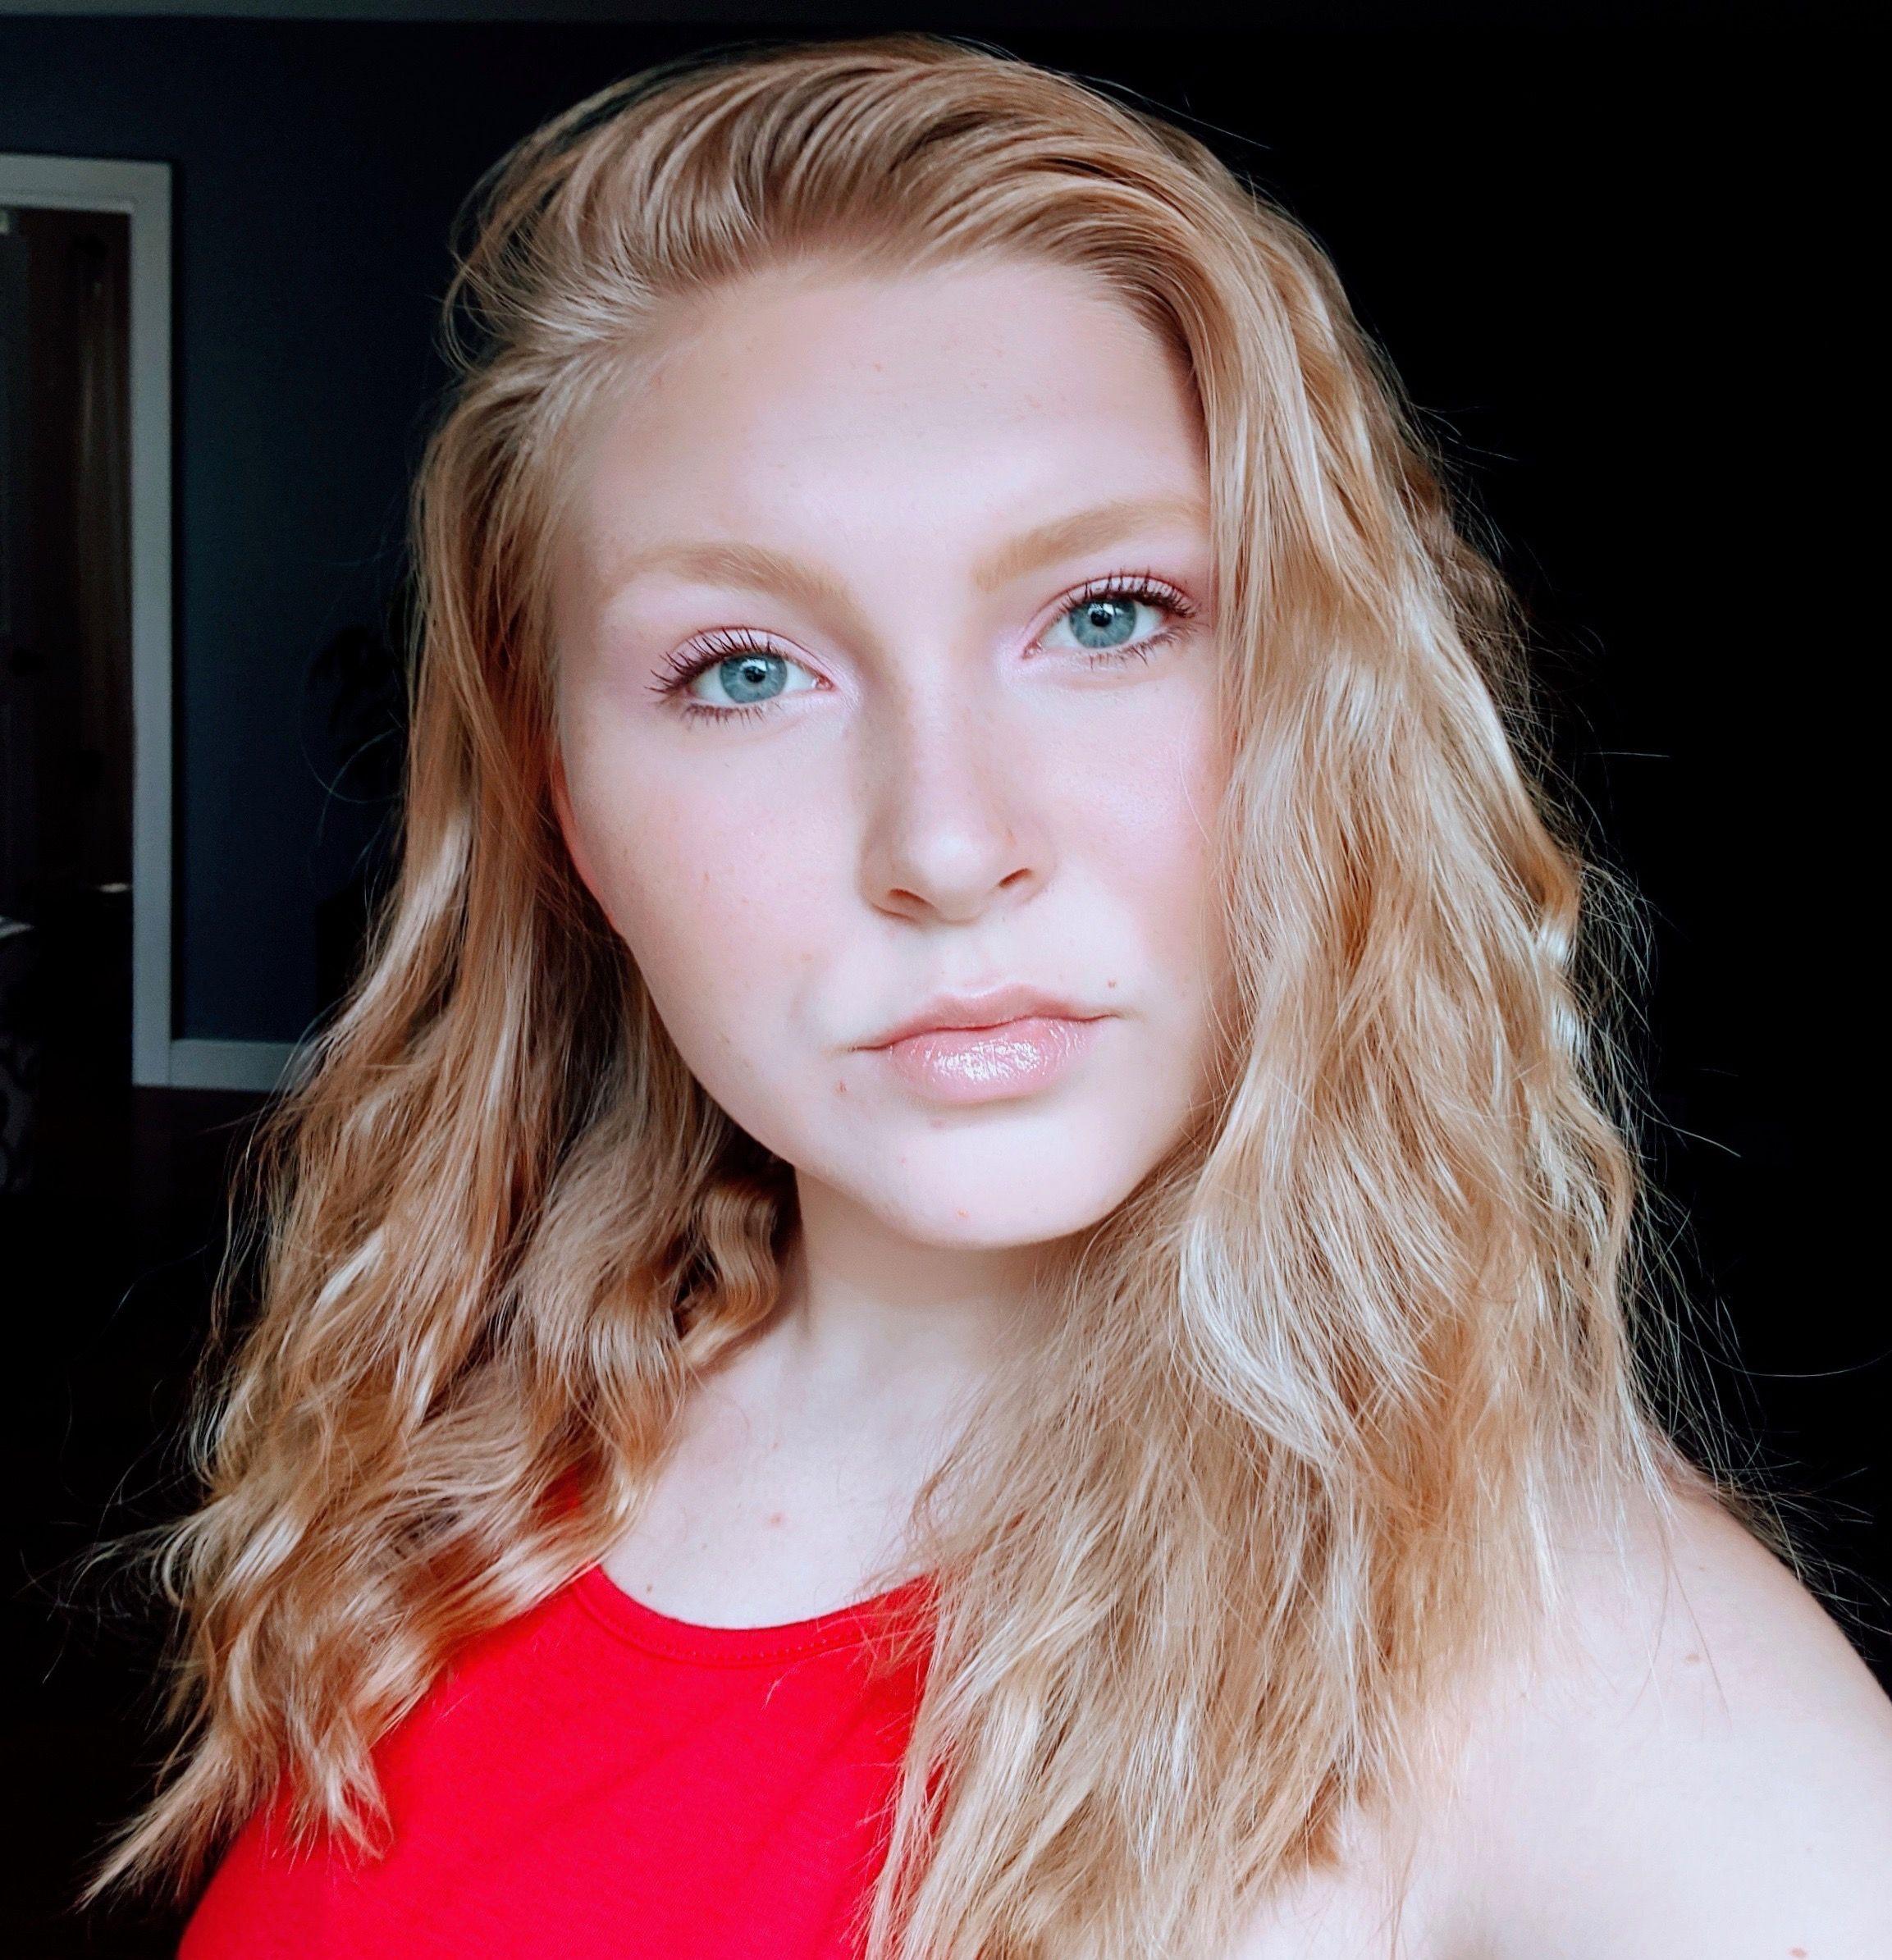 Delaina Tyne, 17 Years